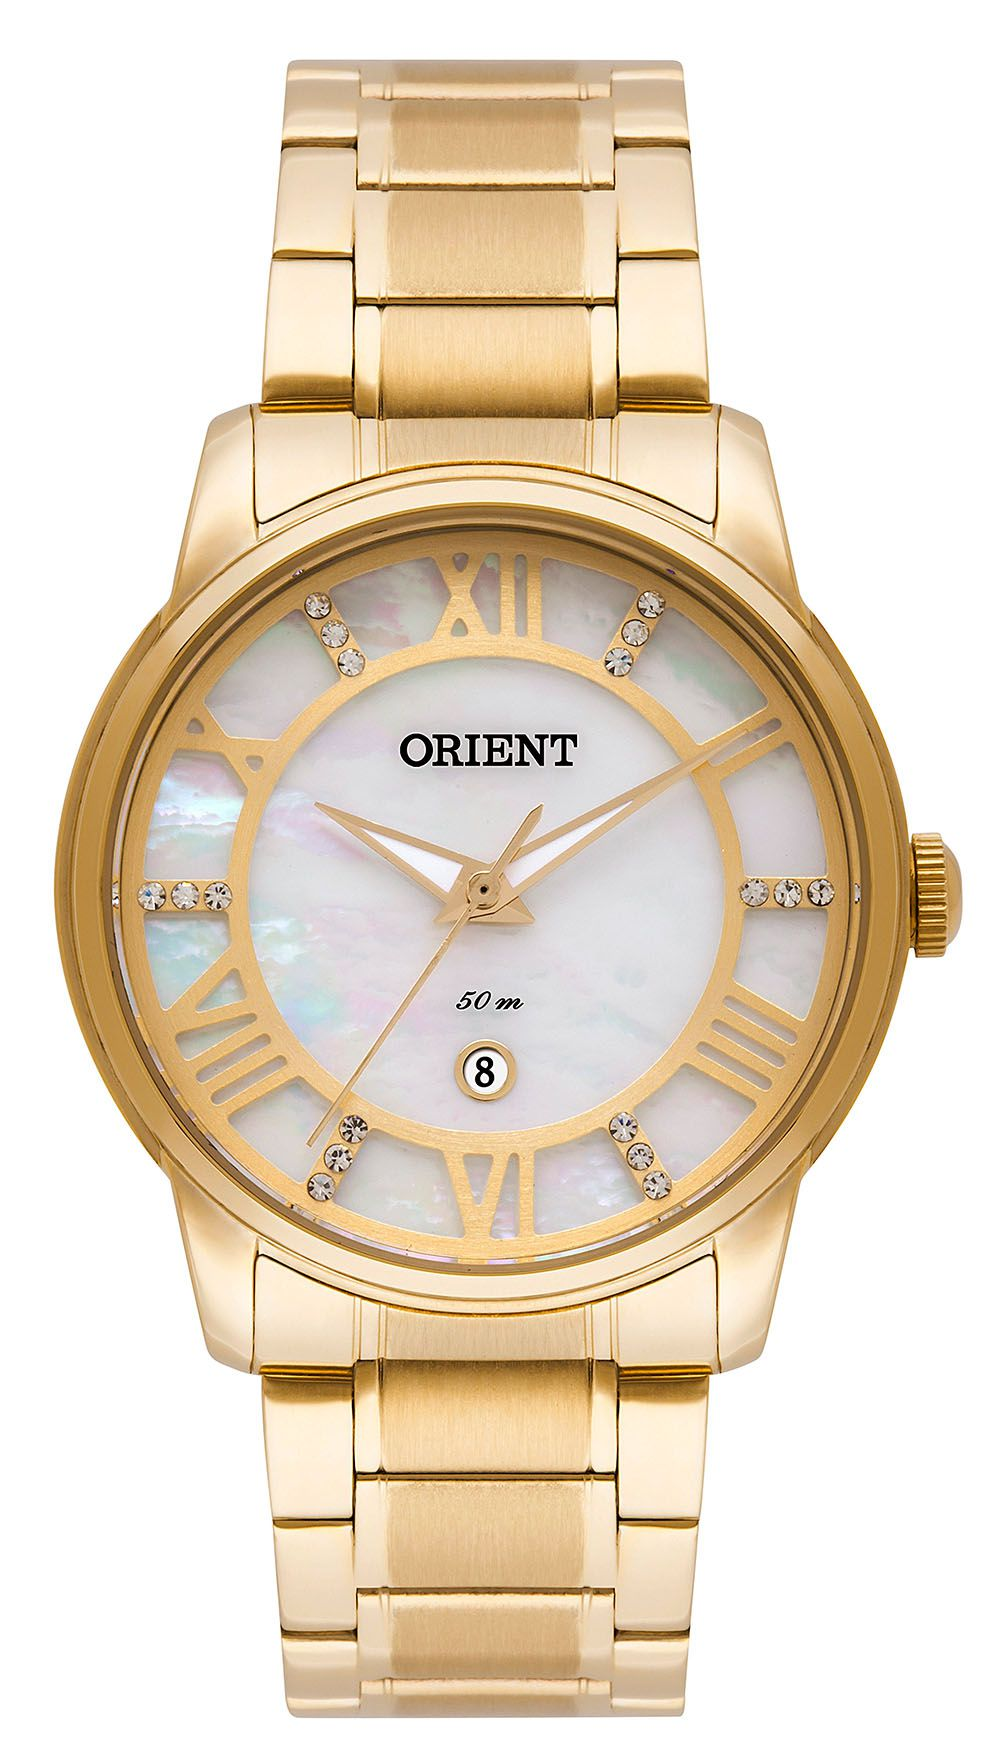 Relógio Orient Feminino FGSS1148-B3KX Dourado